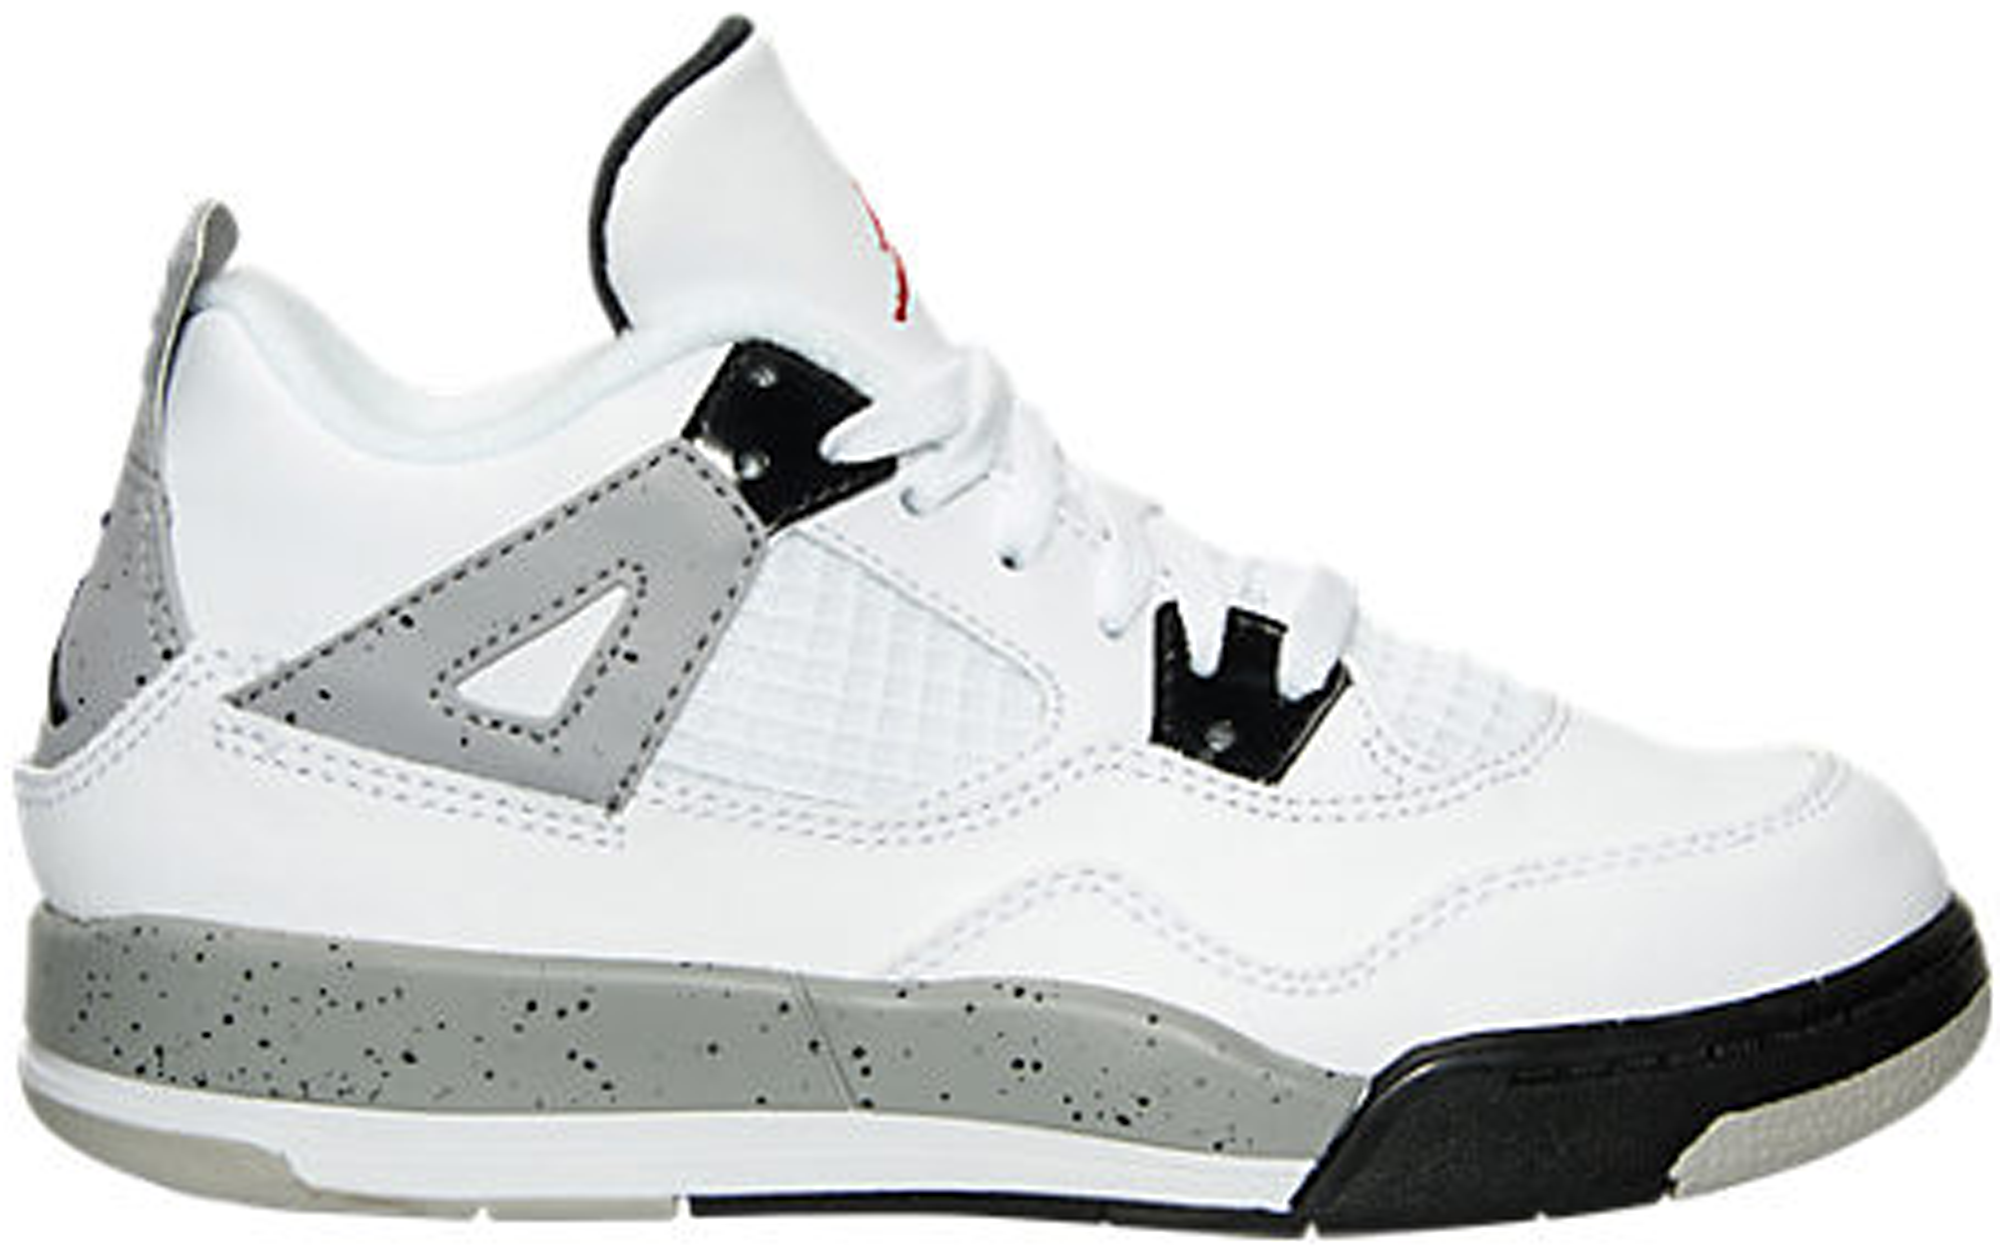 Jordan 4 Retro White Cement 2016 (PS